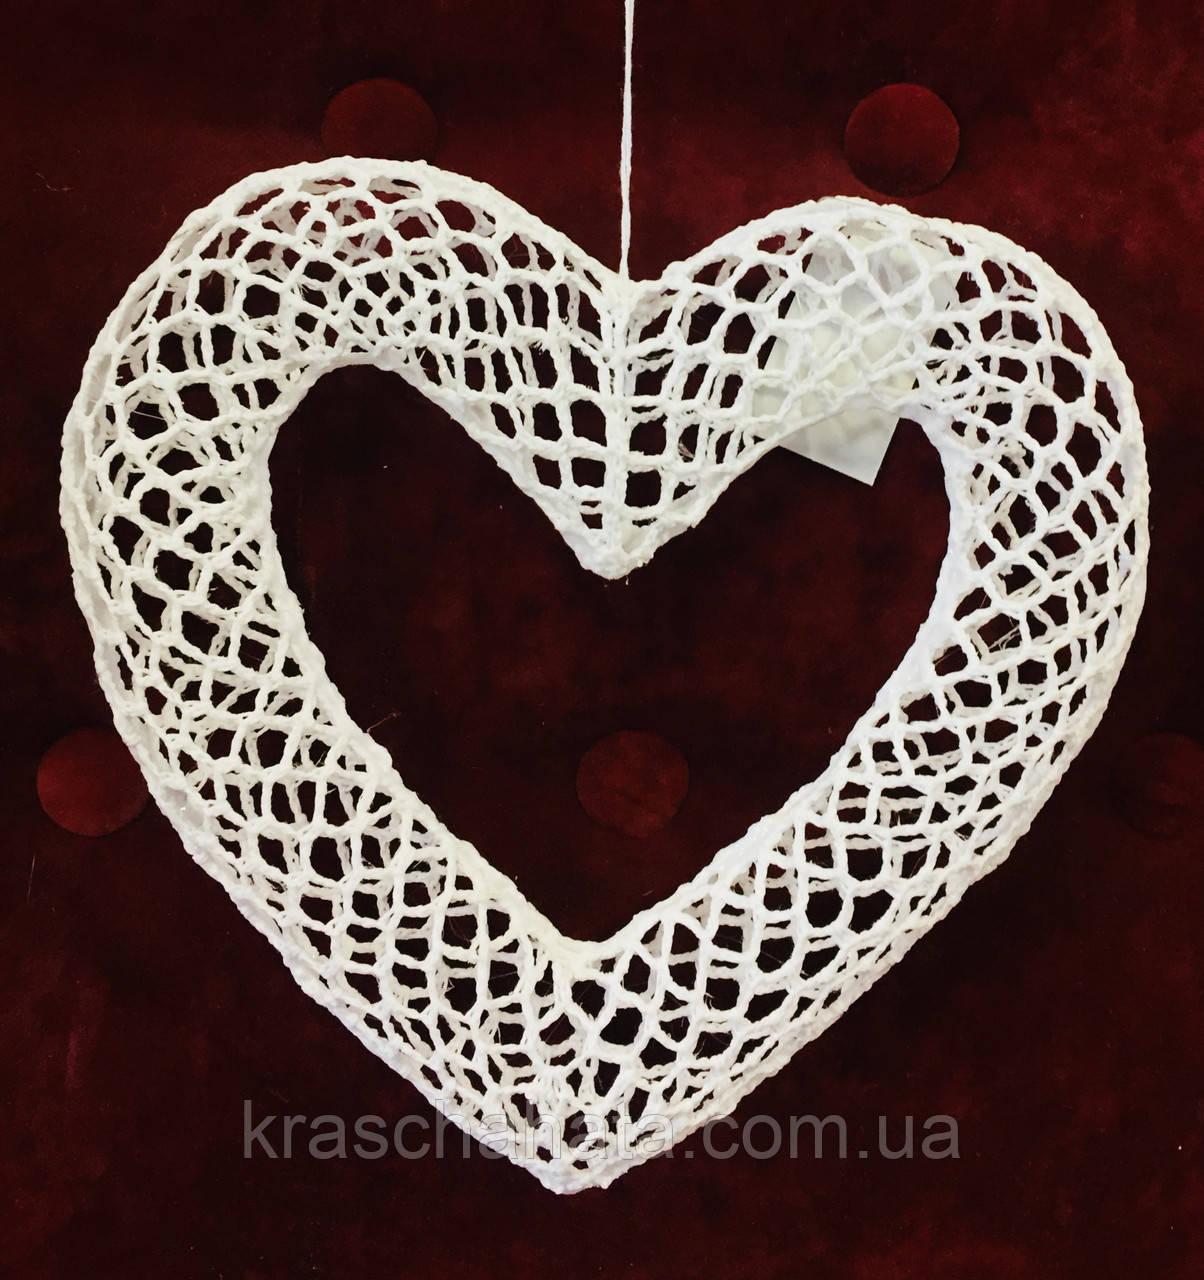 Декорация, Сердце вязанное крючком, 15х15 см, Подарки к дню святого Валентина